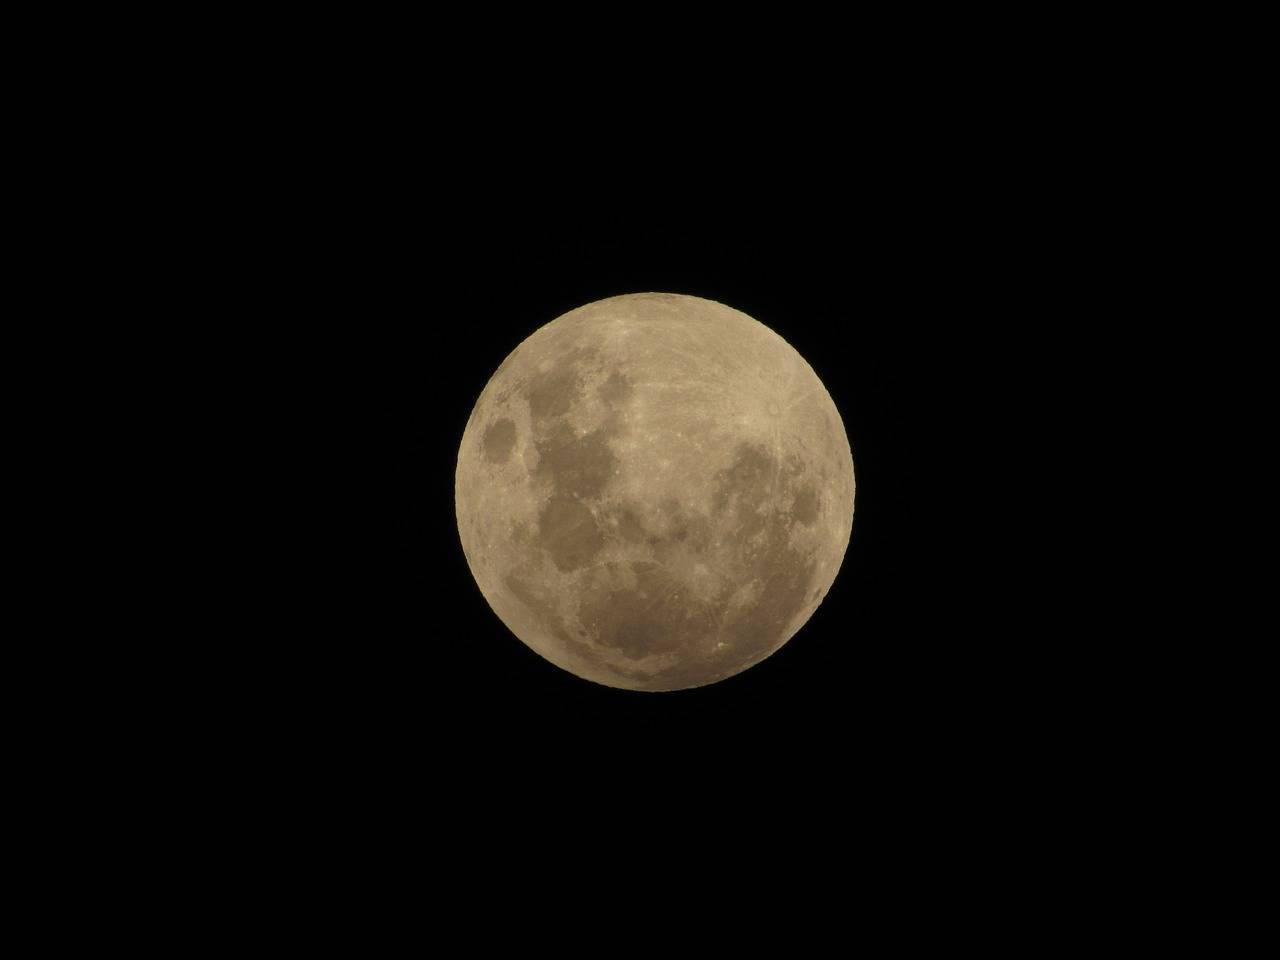 luna piena cervo eclissi